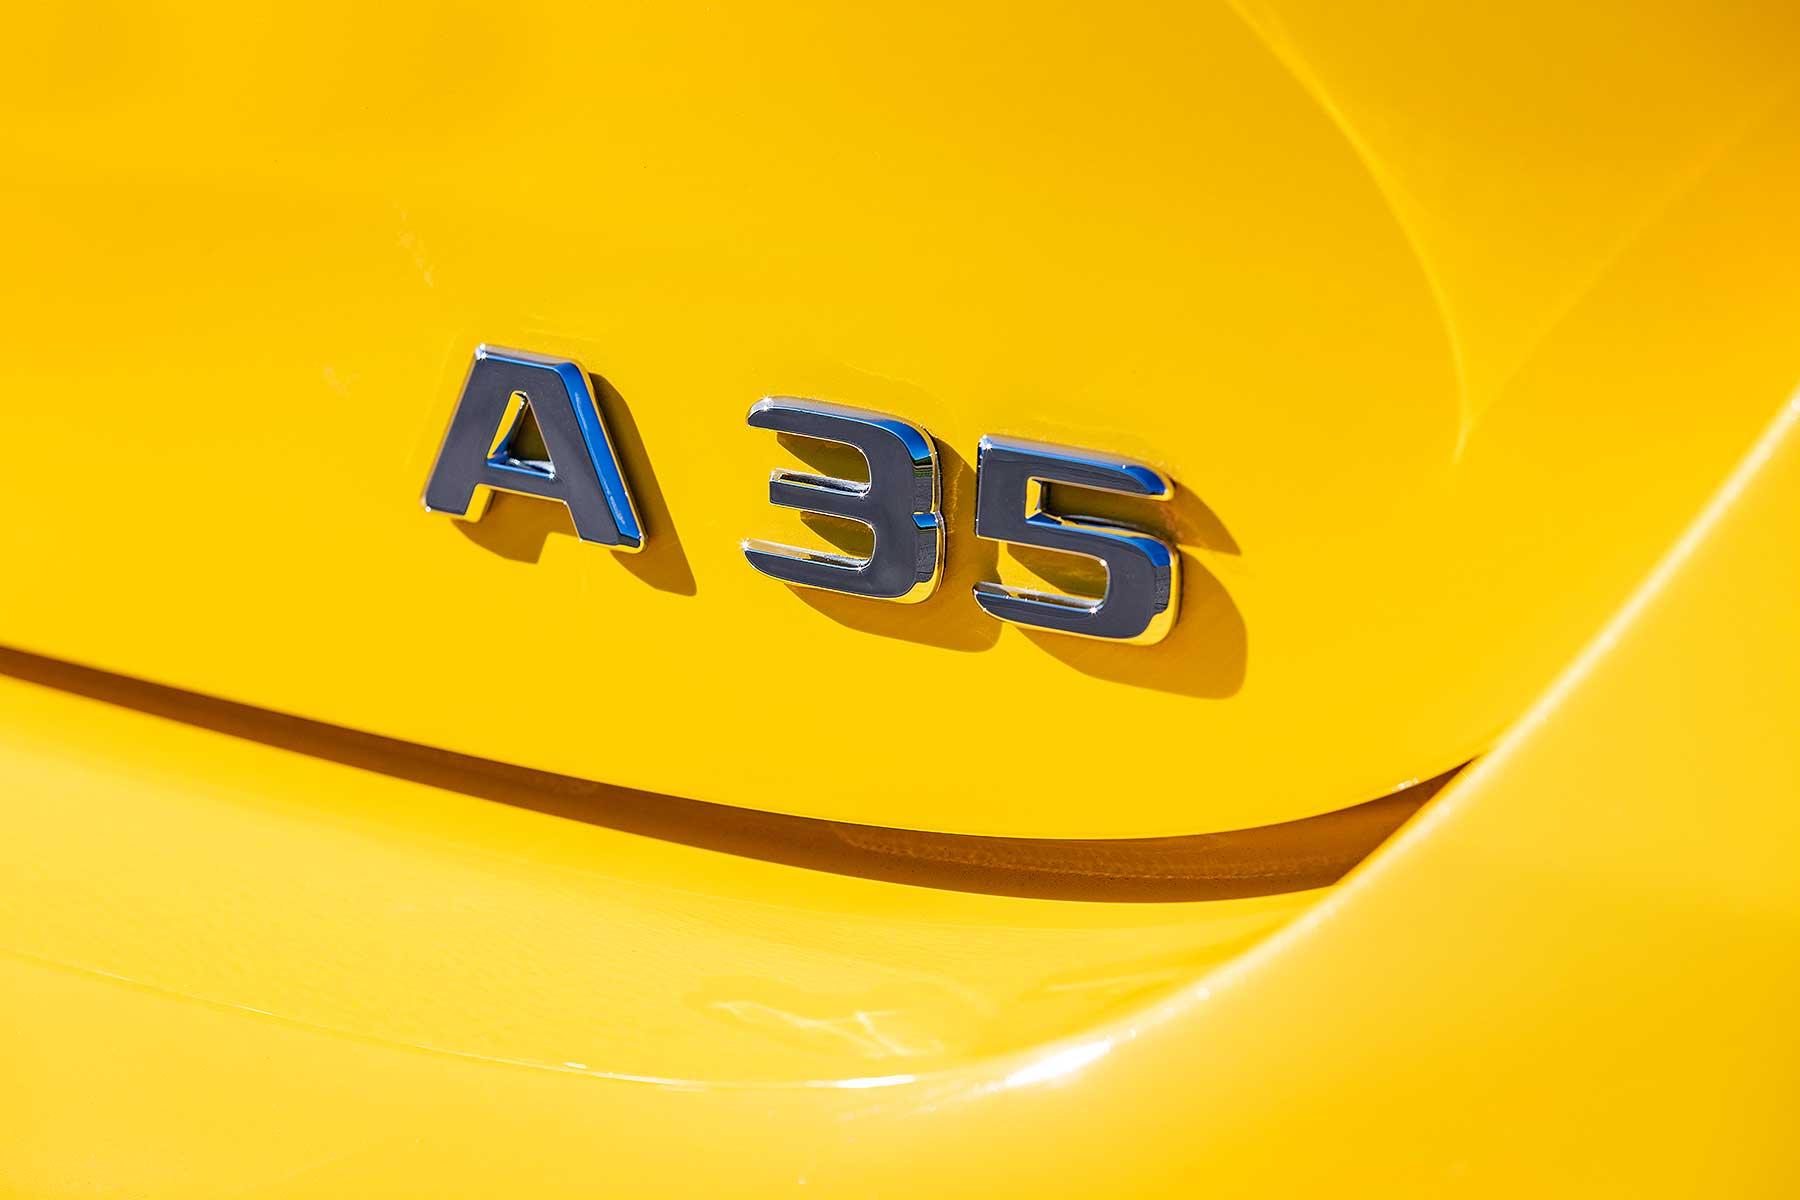 2019 Mercedes-AMG A 35 4Matic